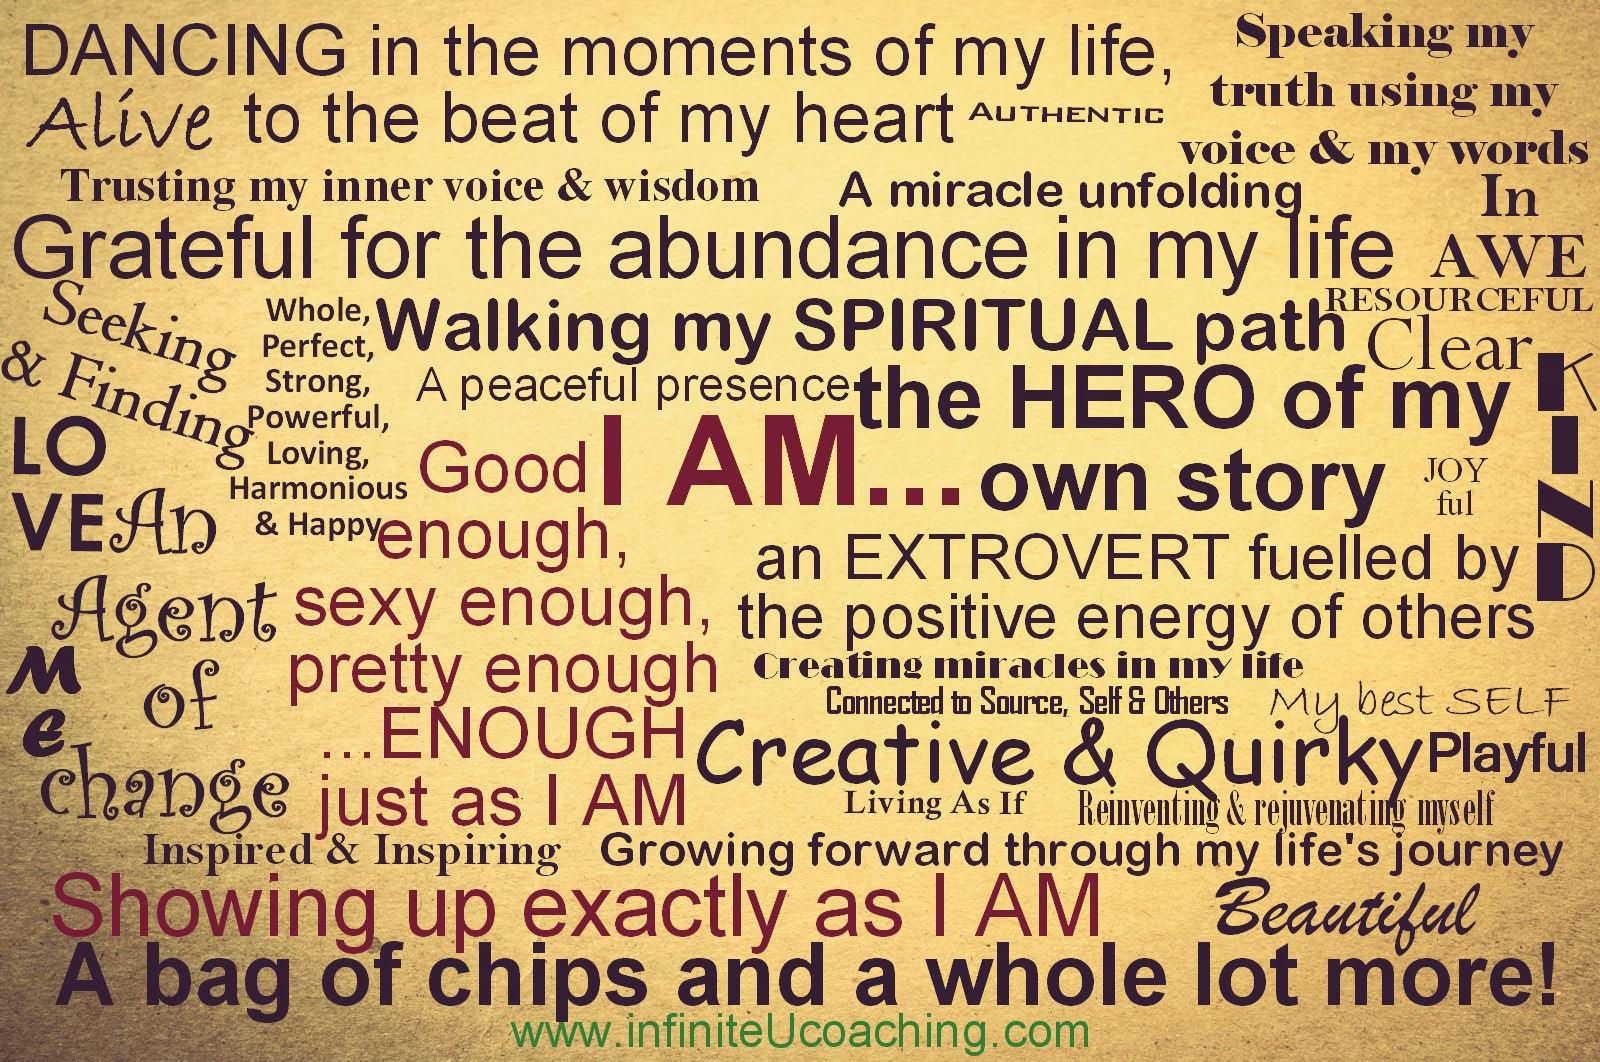 Manifesto Image: Write Your Personal Manifesto